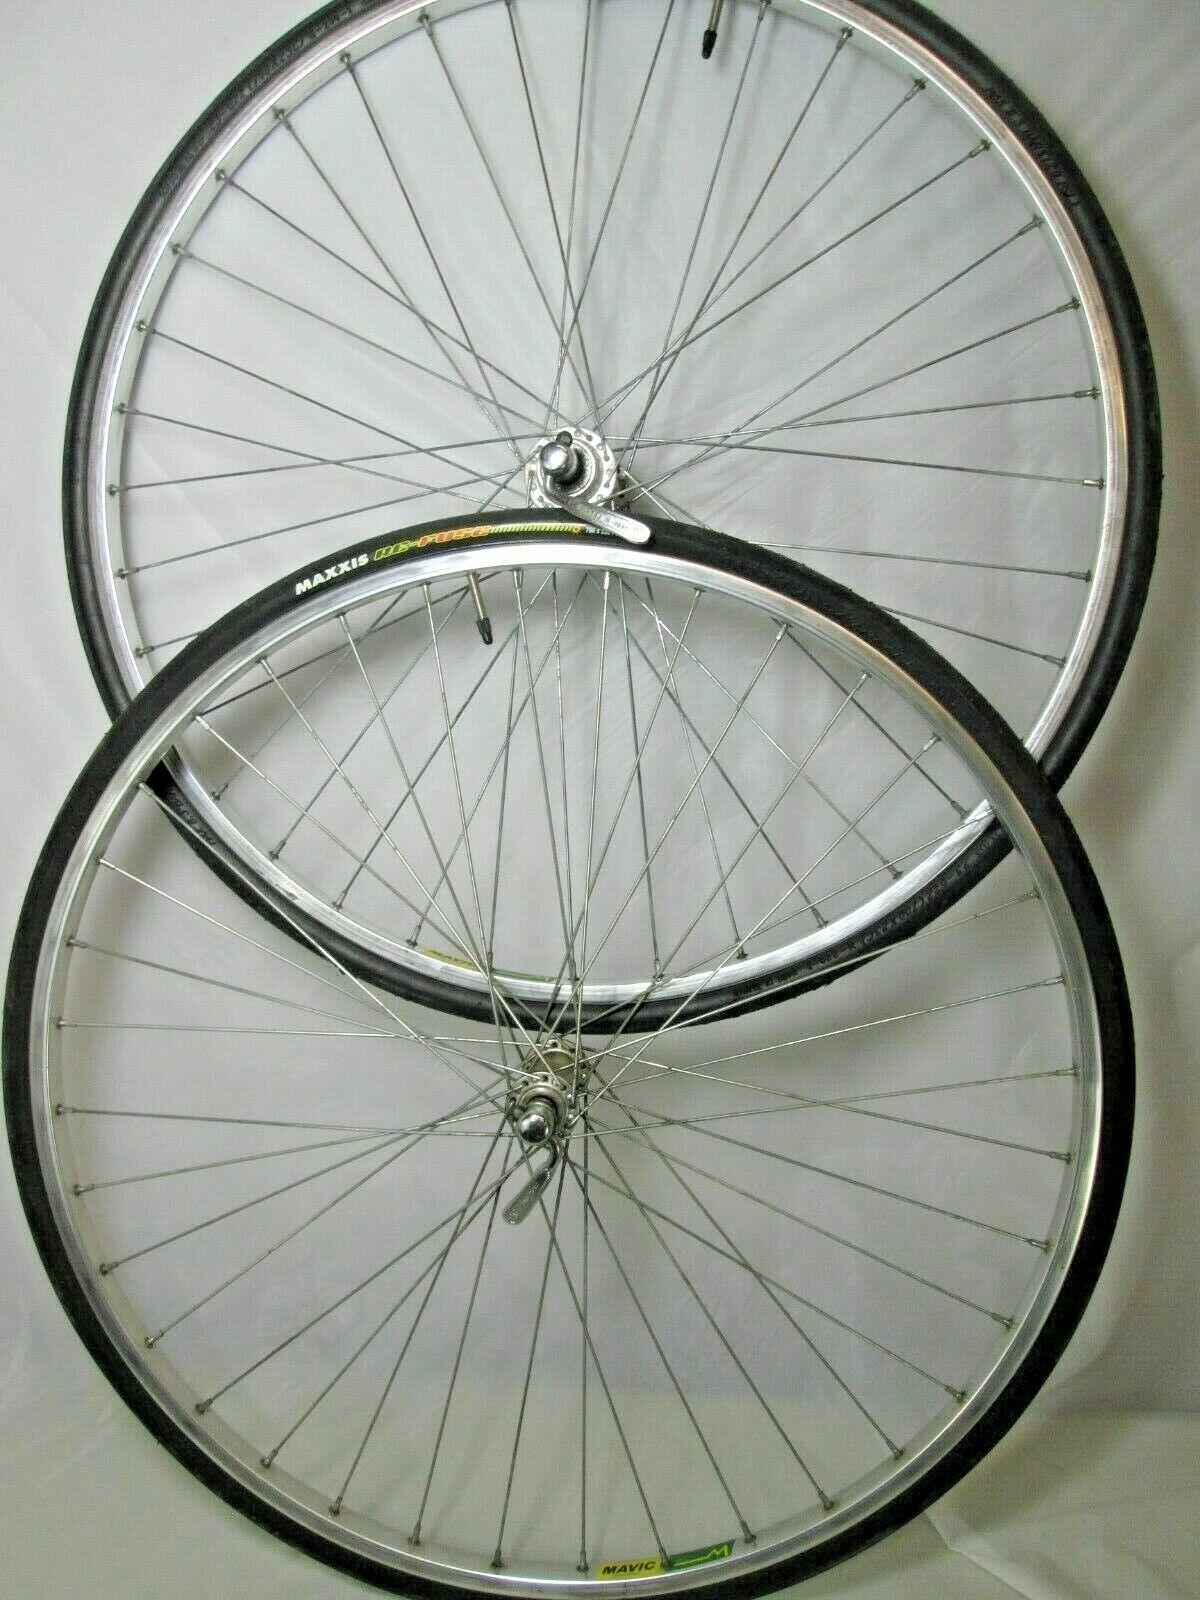 Mallard 36 hole  MAVIC MA 2 ROAD BICYCLE 700c WHEELSET   Wheel Rim Set   Tires